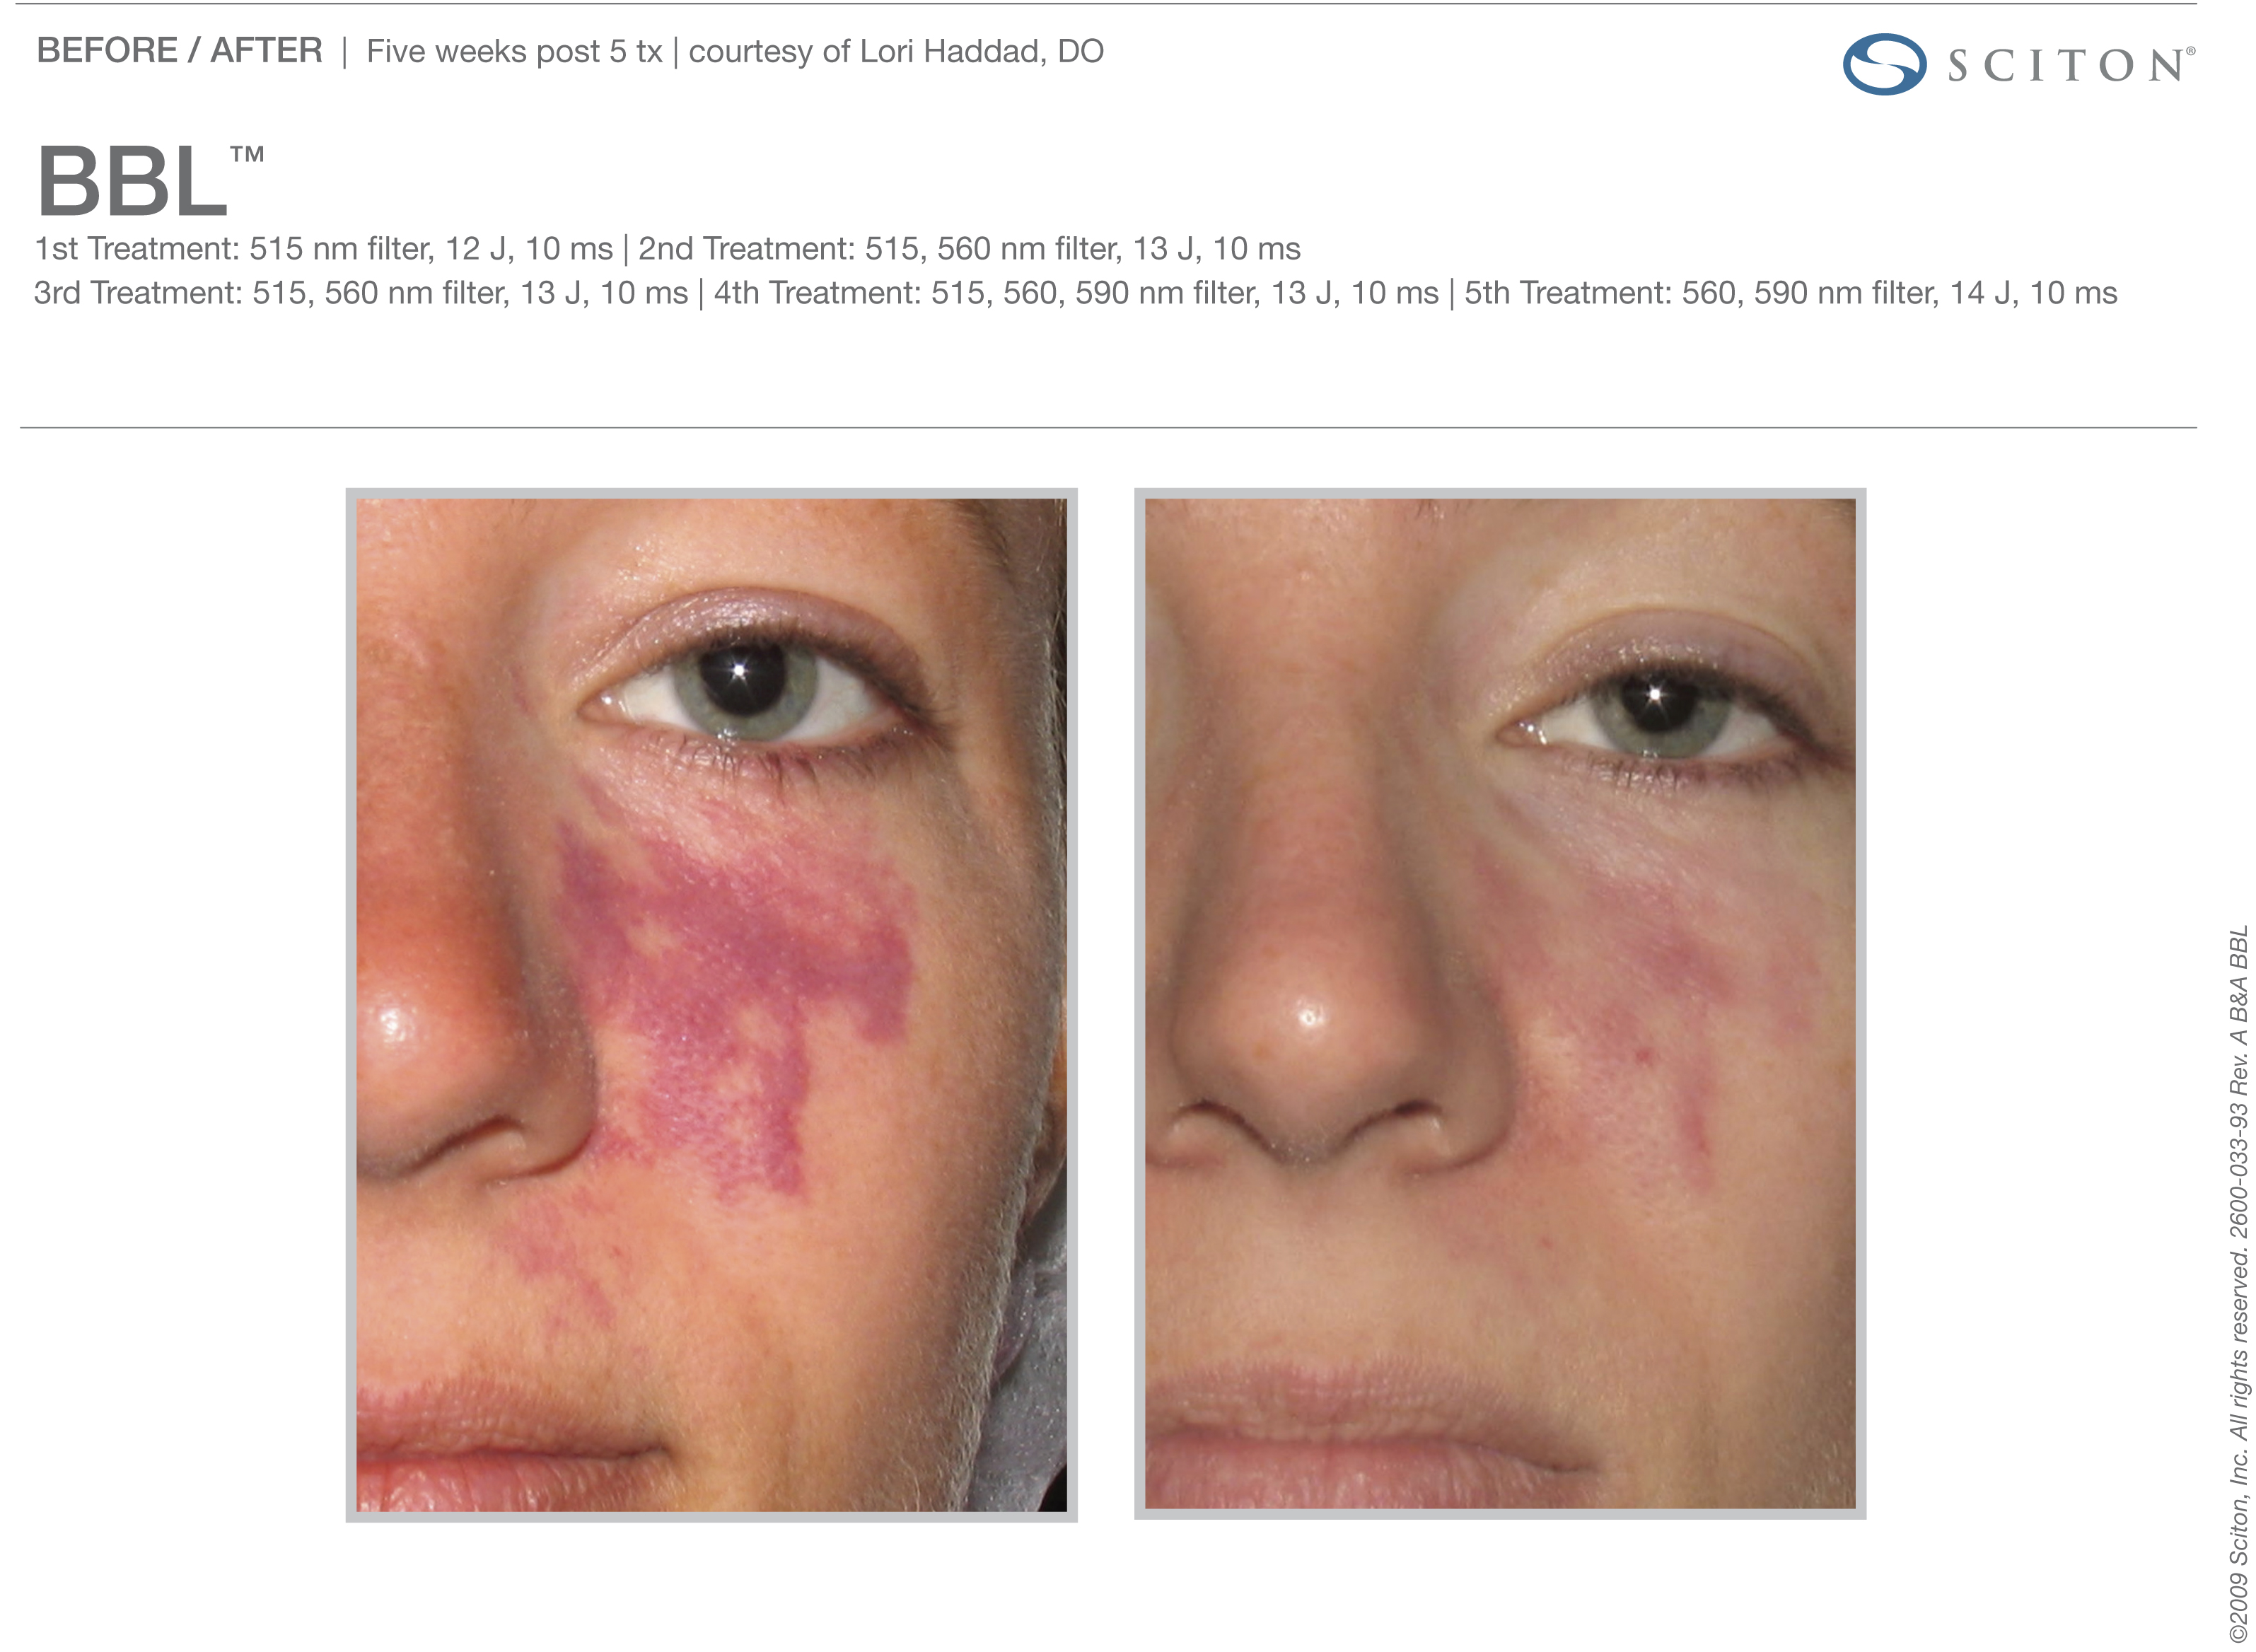 Pigmented Facial Lesions